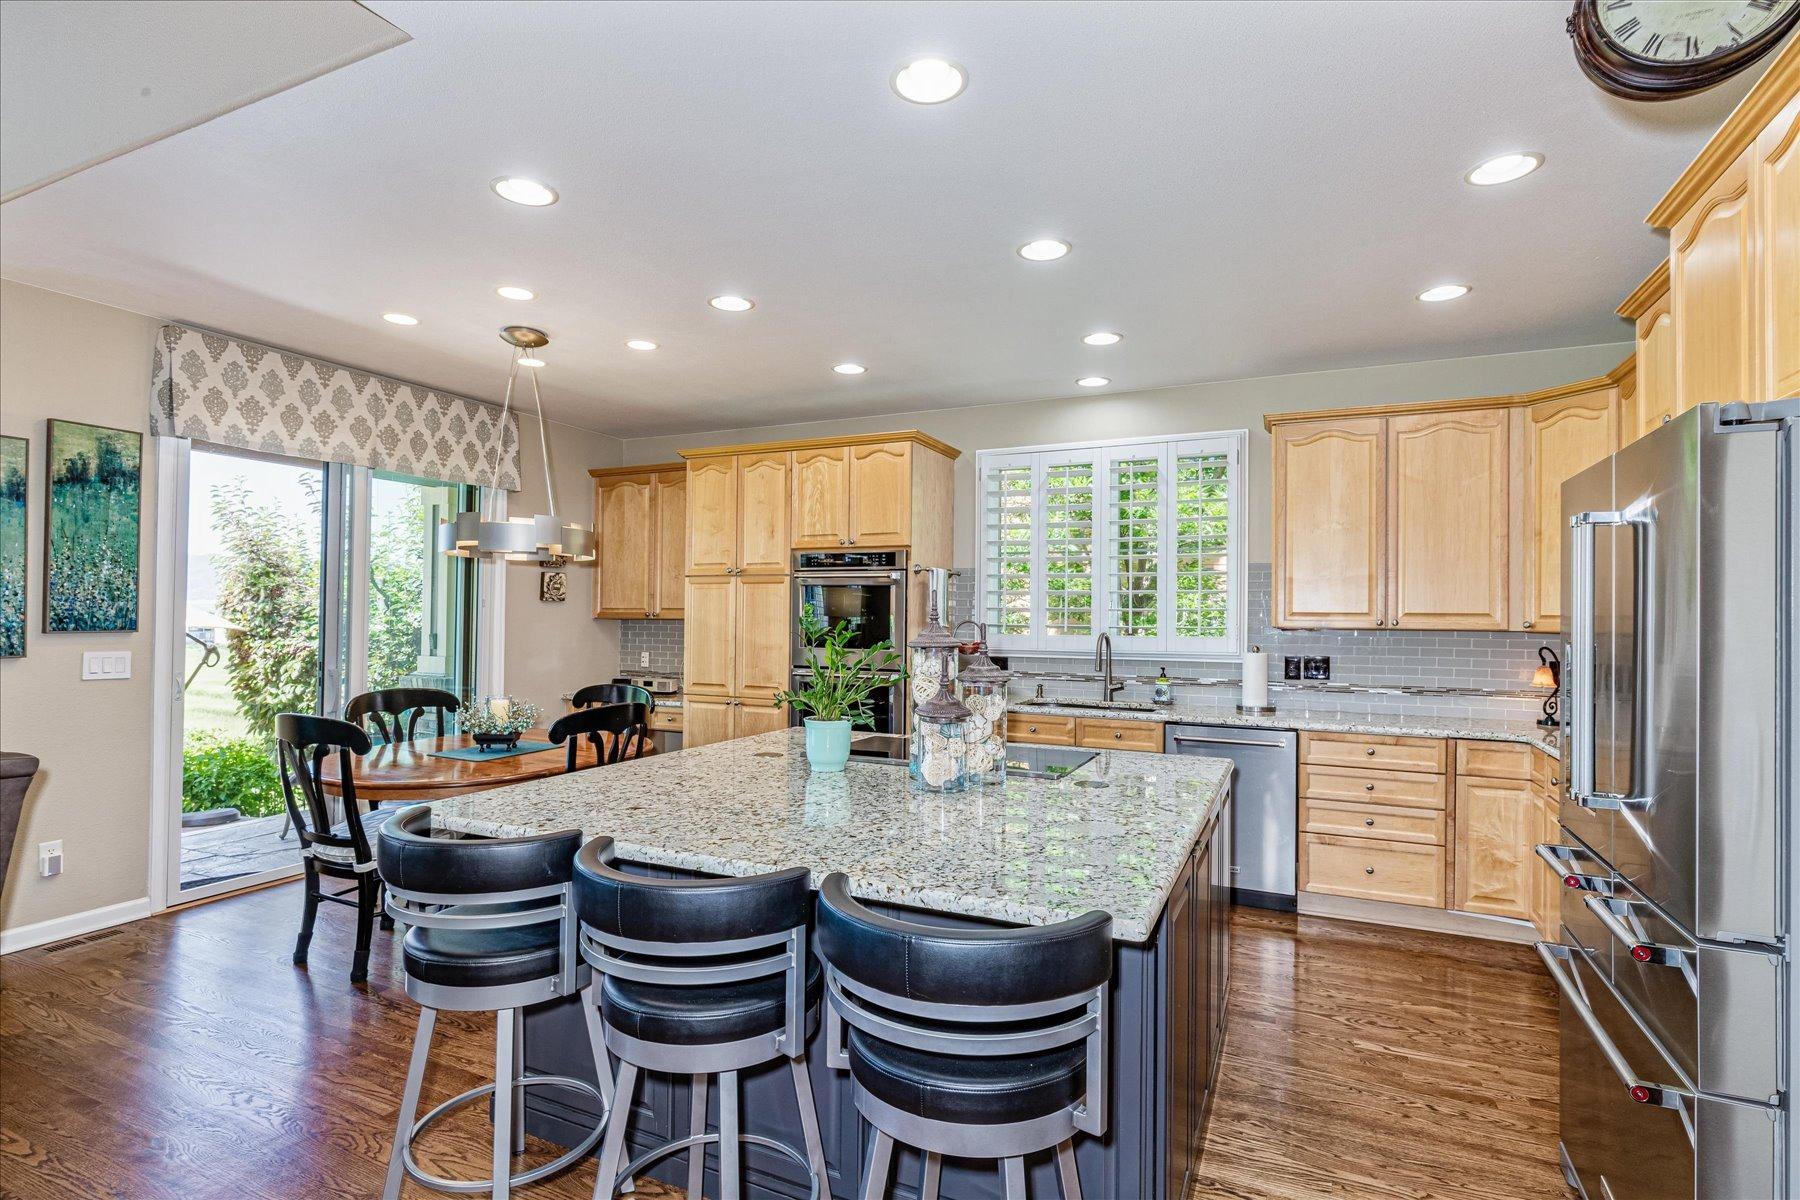 Kitchen Remodel Features Large Slab Granite Island